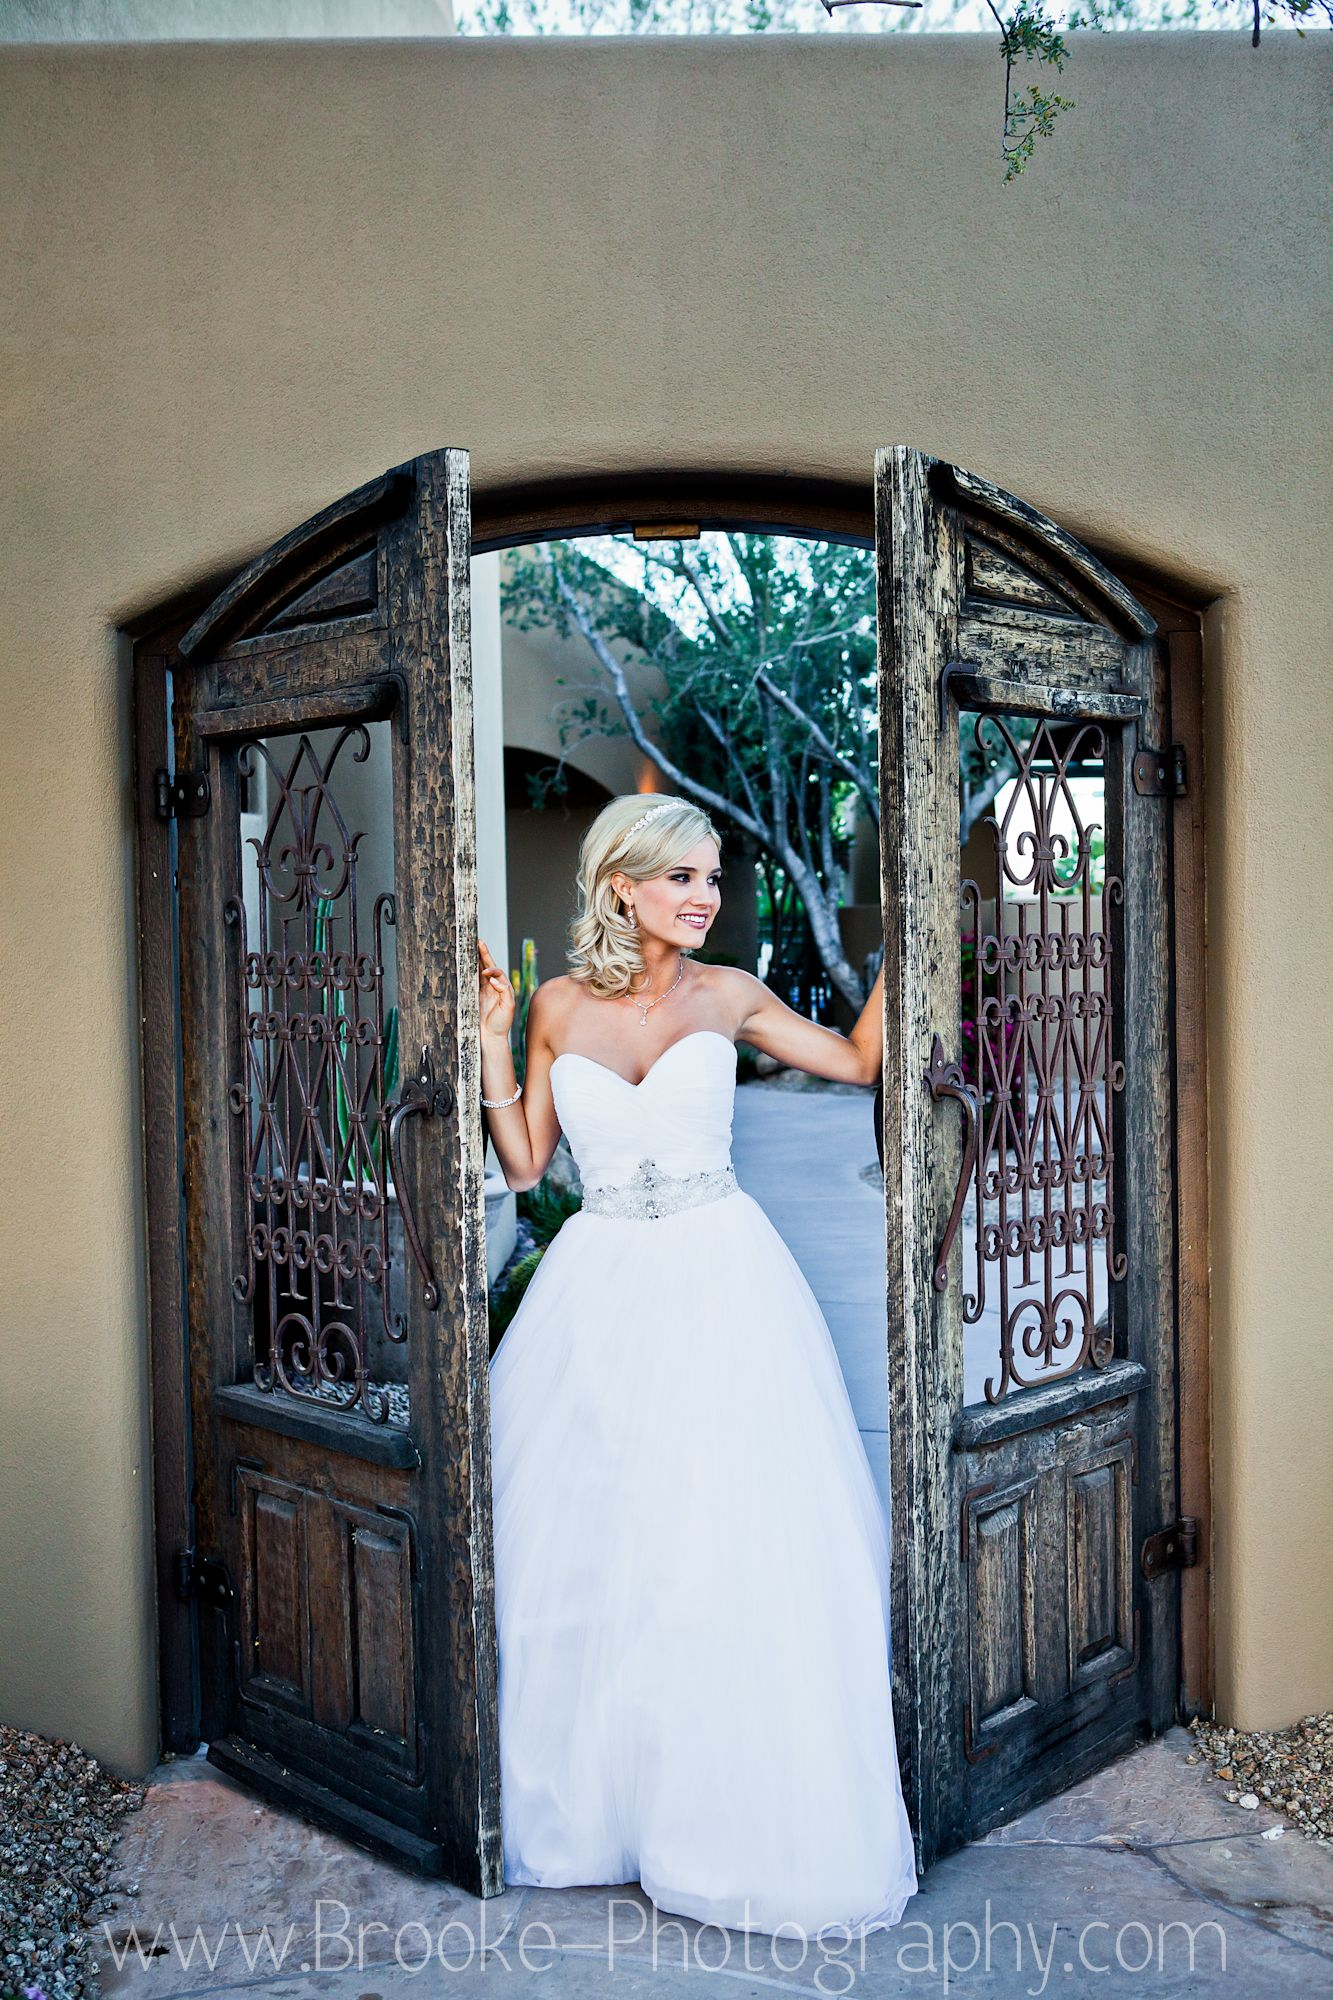 Unique Outdoor Wedding Venue in Scottsdale, Arizona ...